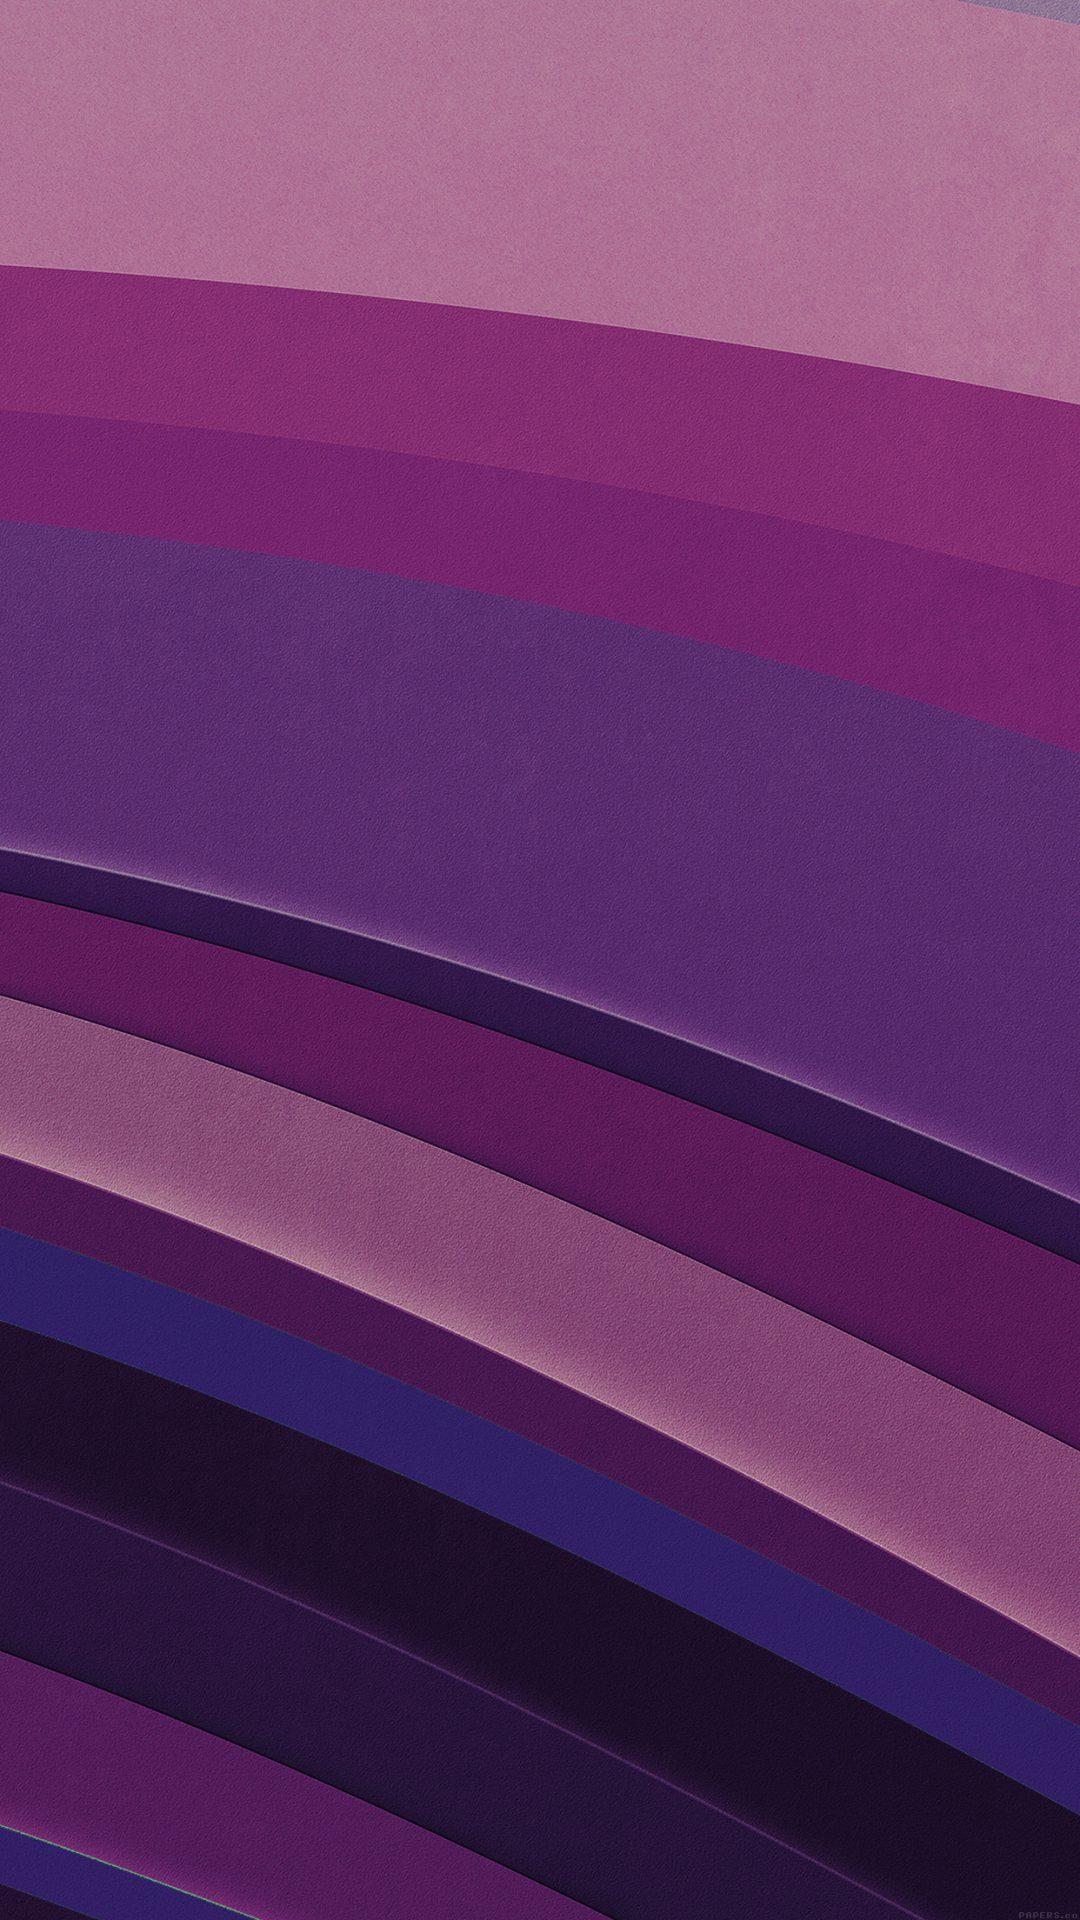 Sea Abstract Purple Graphic Art Pattern